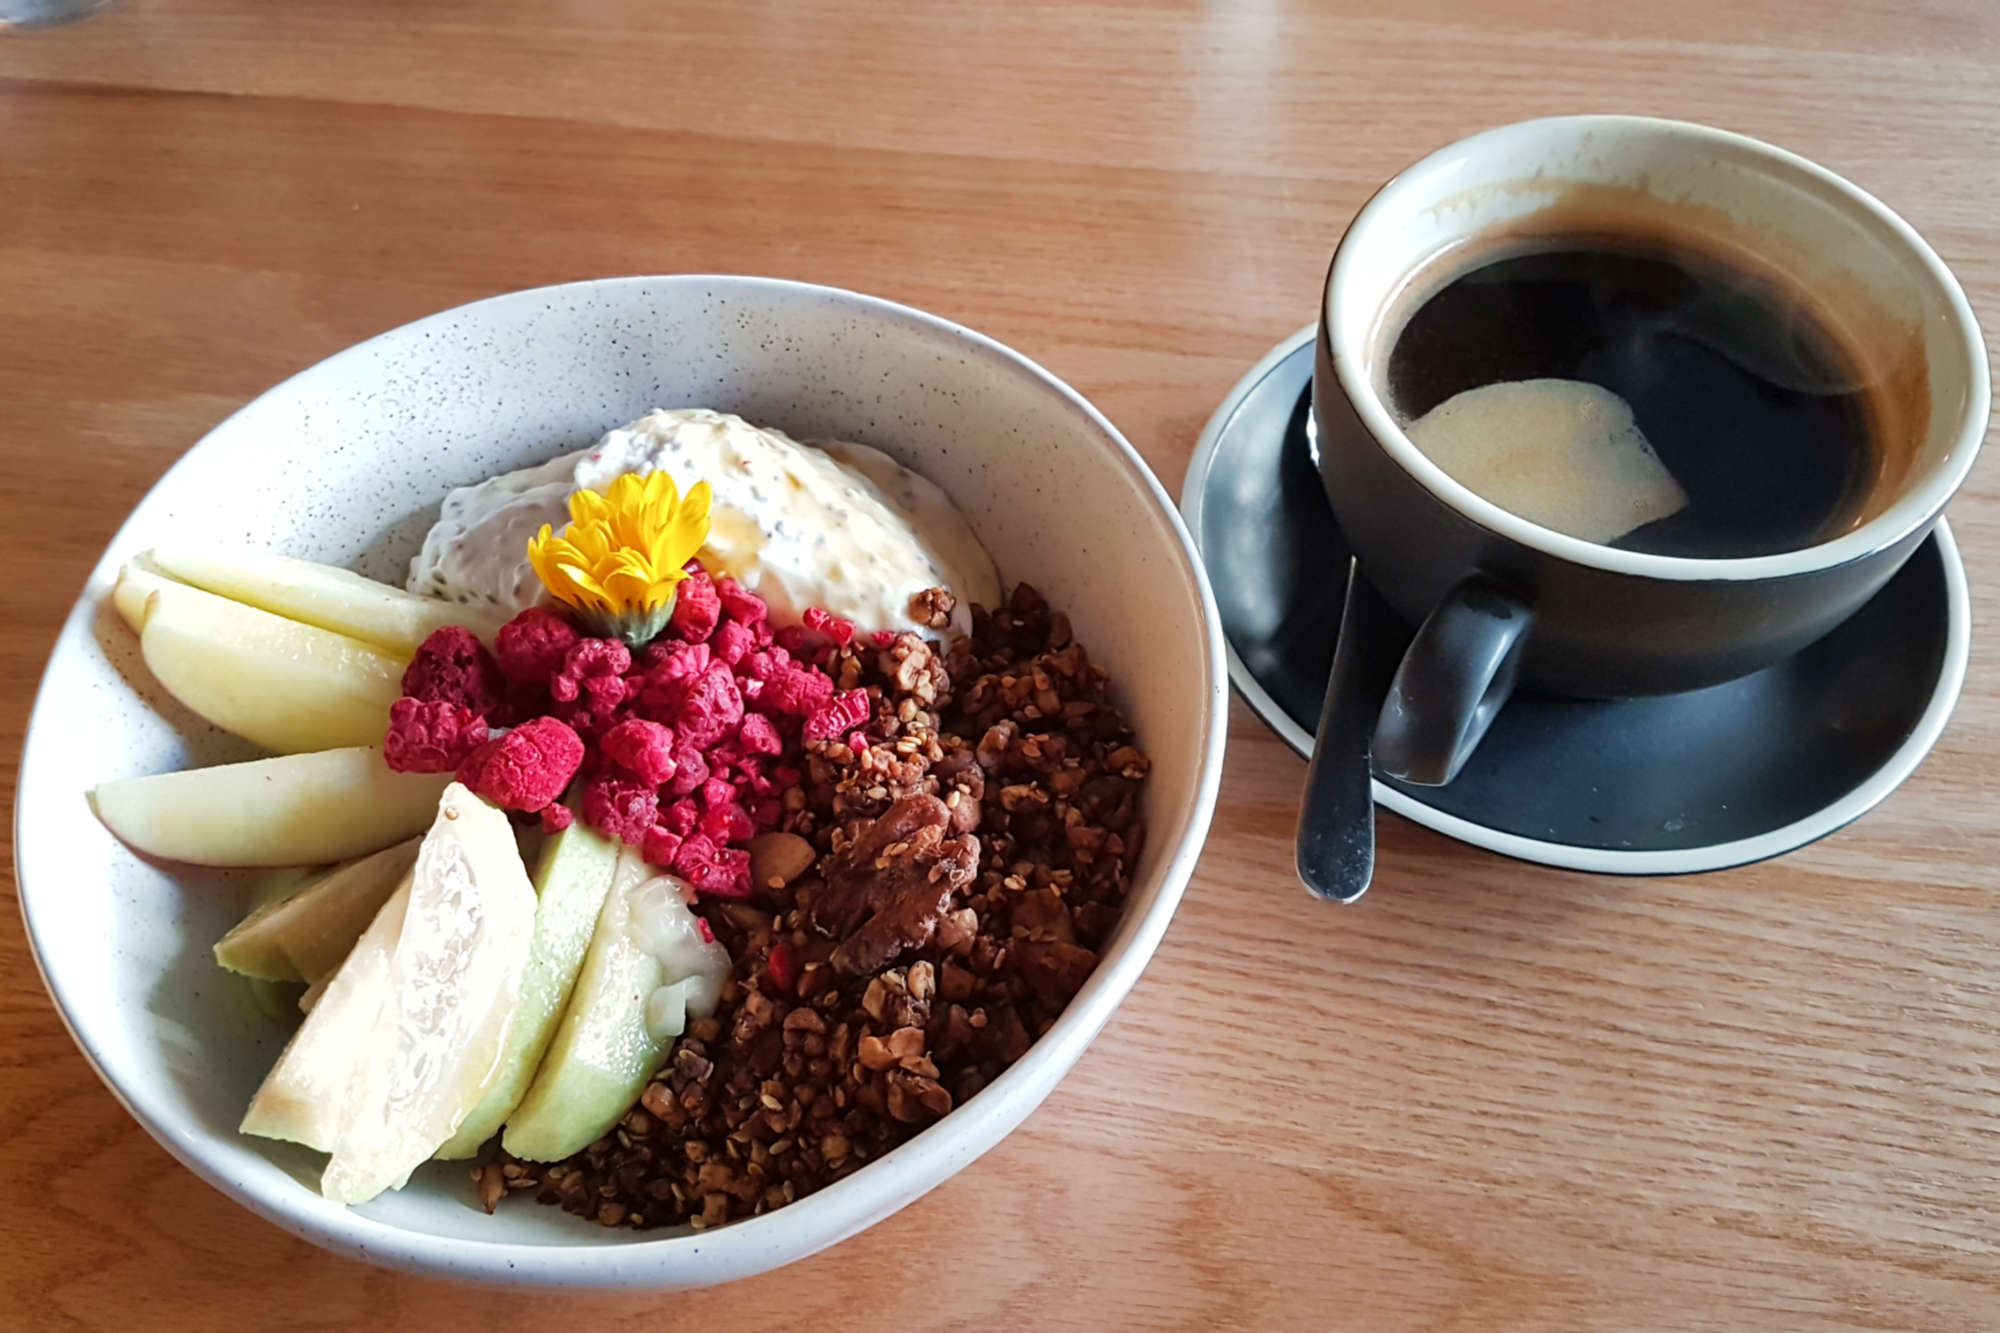 Nolita - granola and coffee